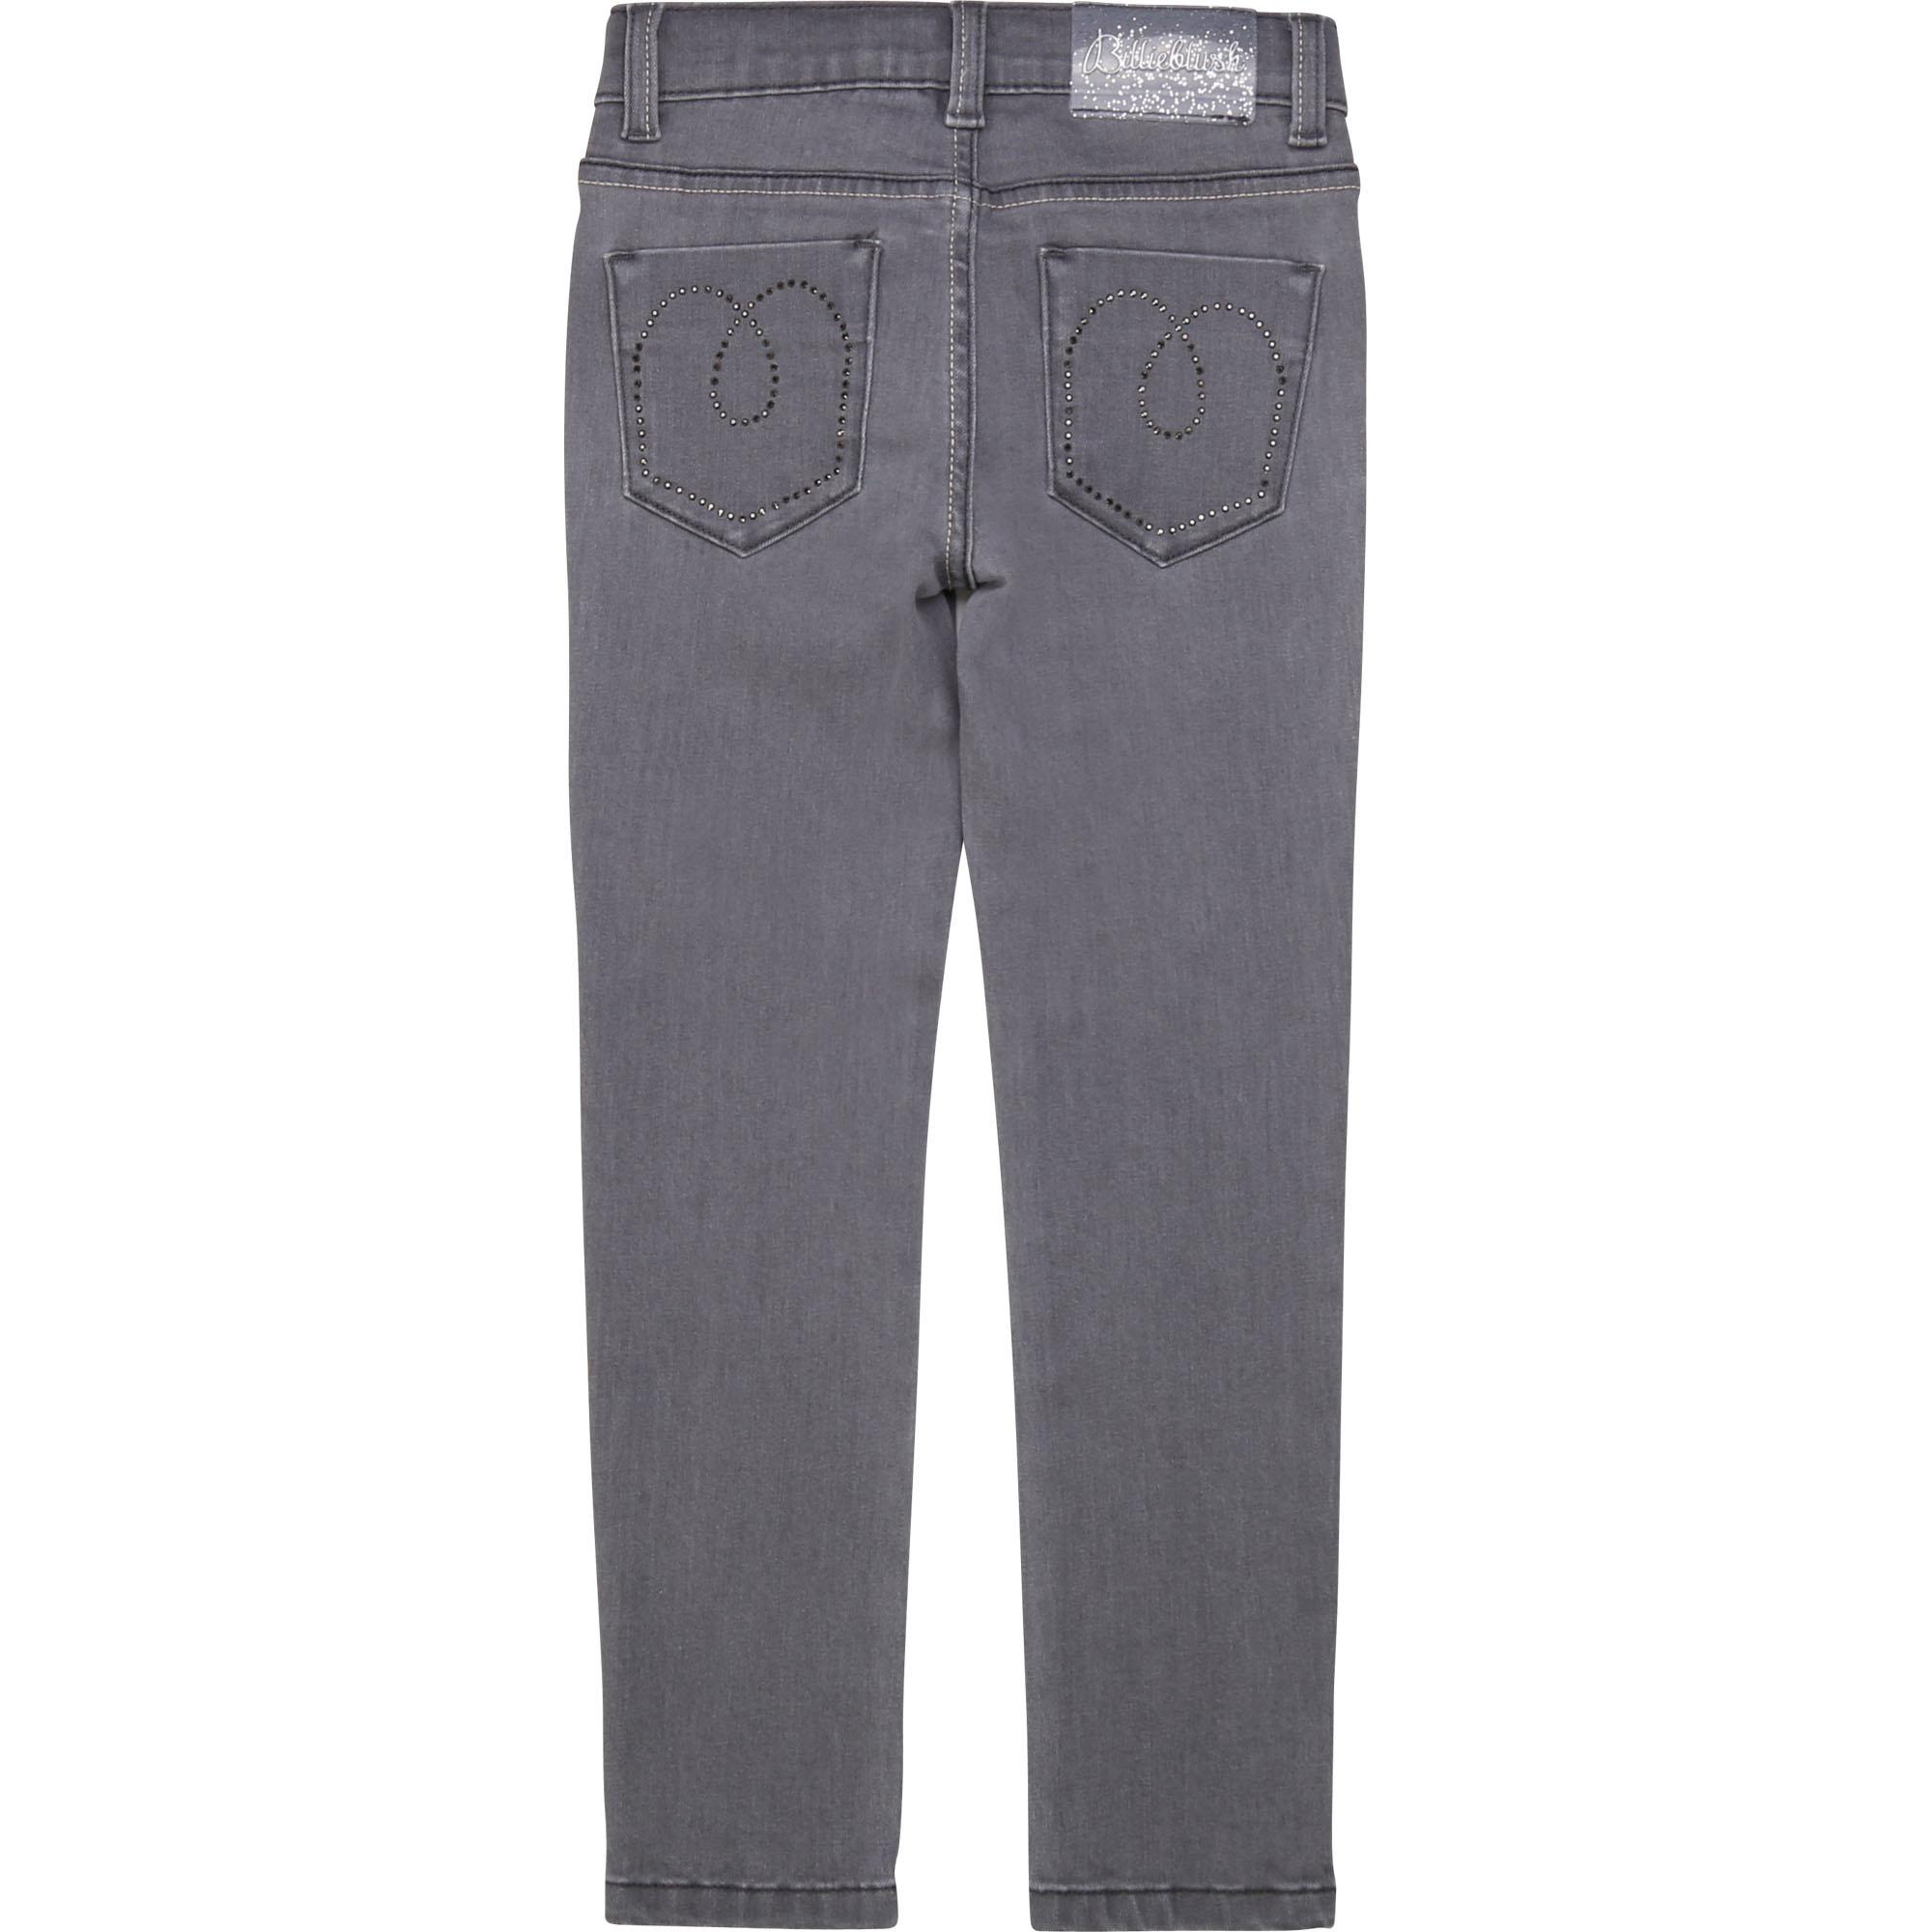 BILLIEBLUSH jeans avec strass-2